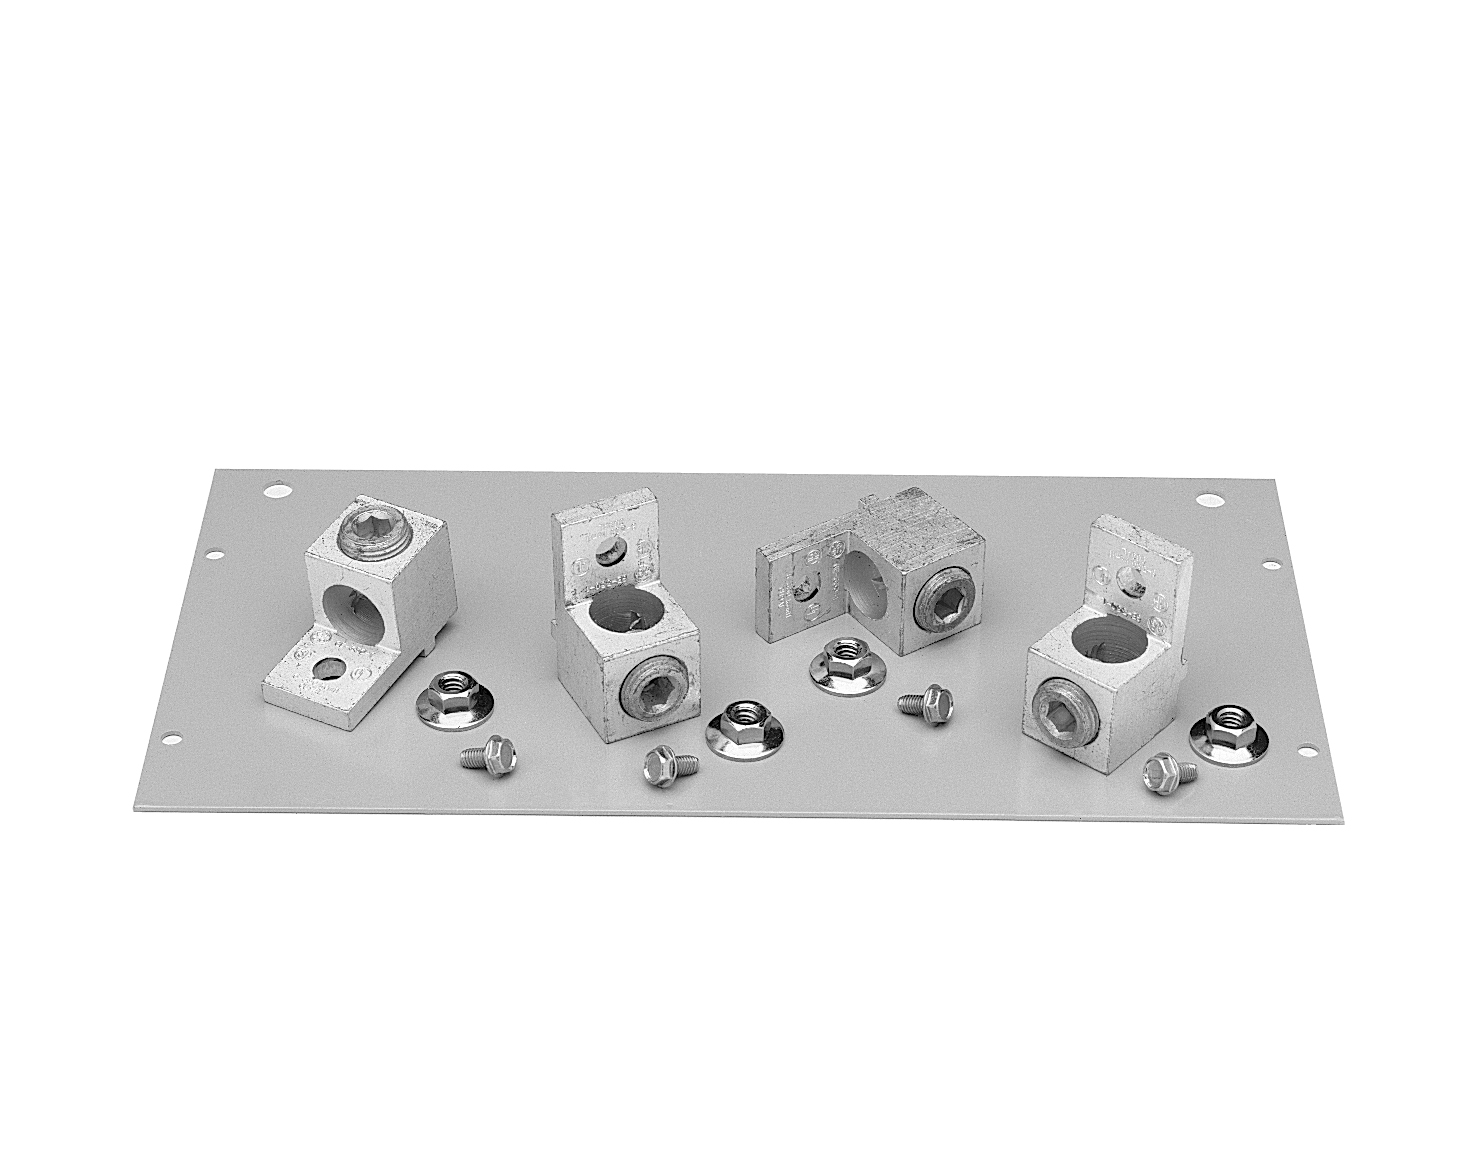 GE,MLA41,General Electric MLA41 Pressure Lug Kit, 400 AMP, 1 - 600 MCM/(2) 1/0 - 250 MCM Cable